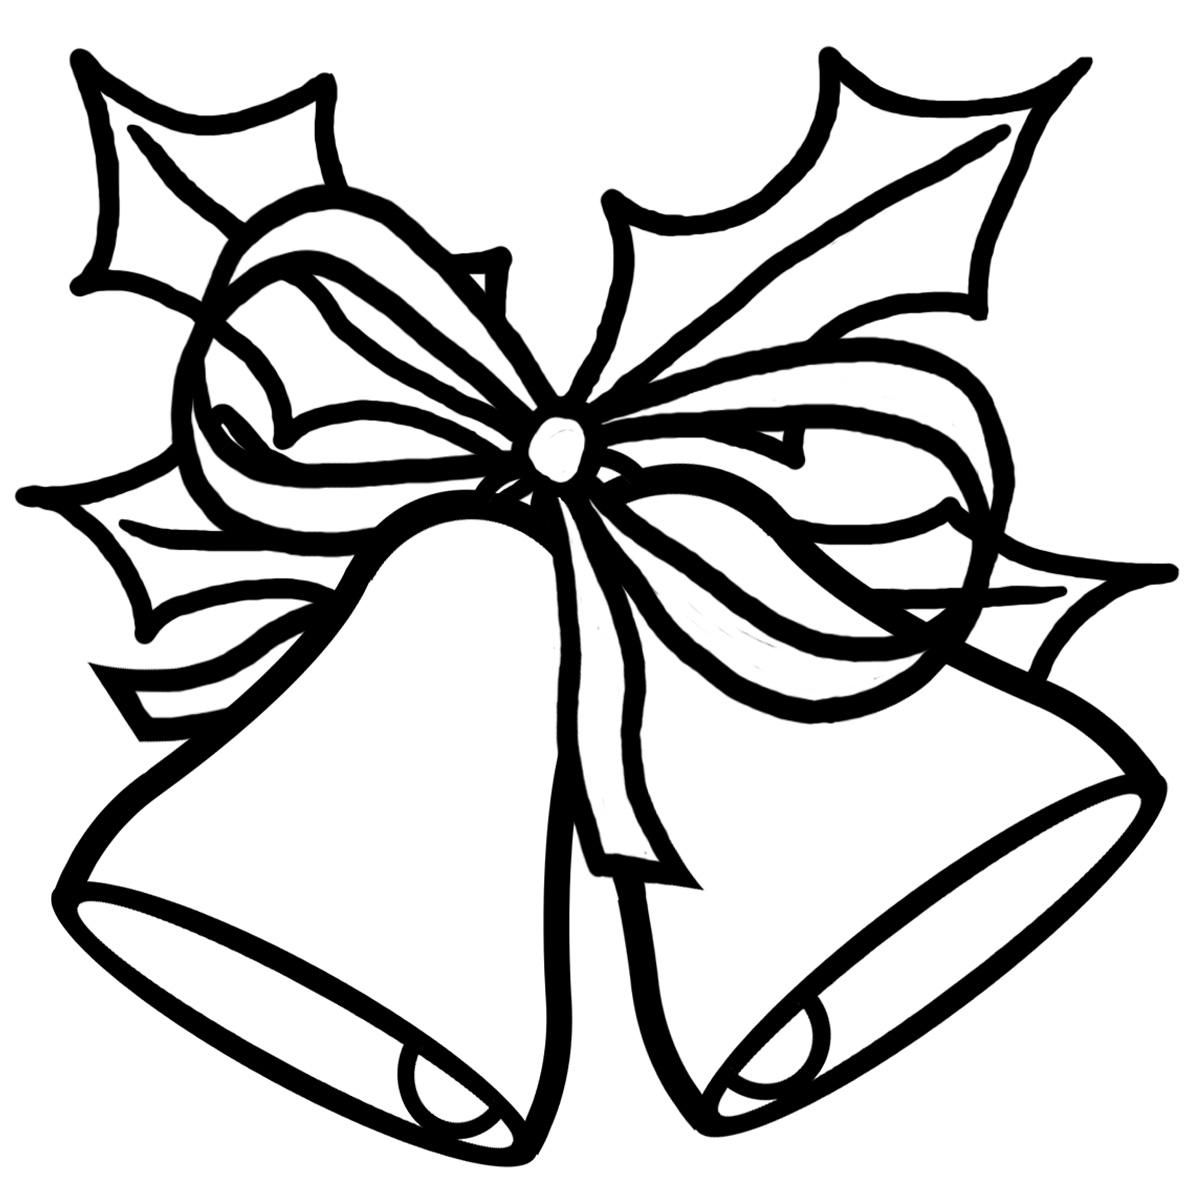 Clipart Christmas Tree Black White Clipart Panda